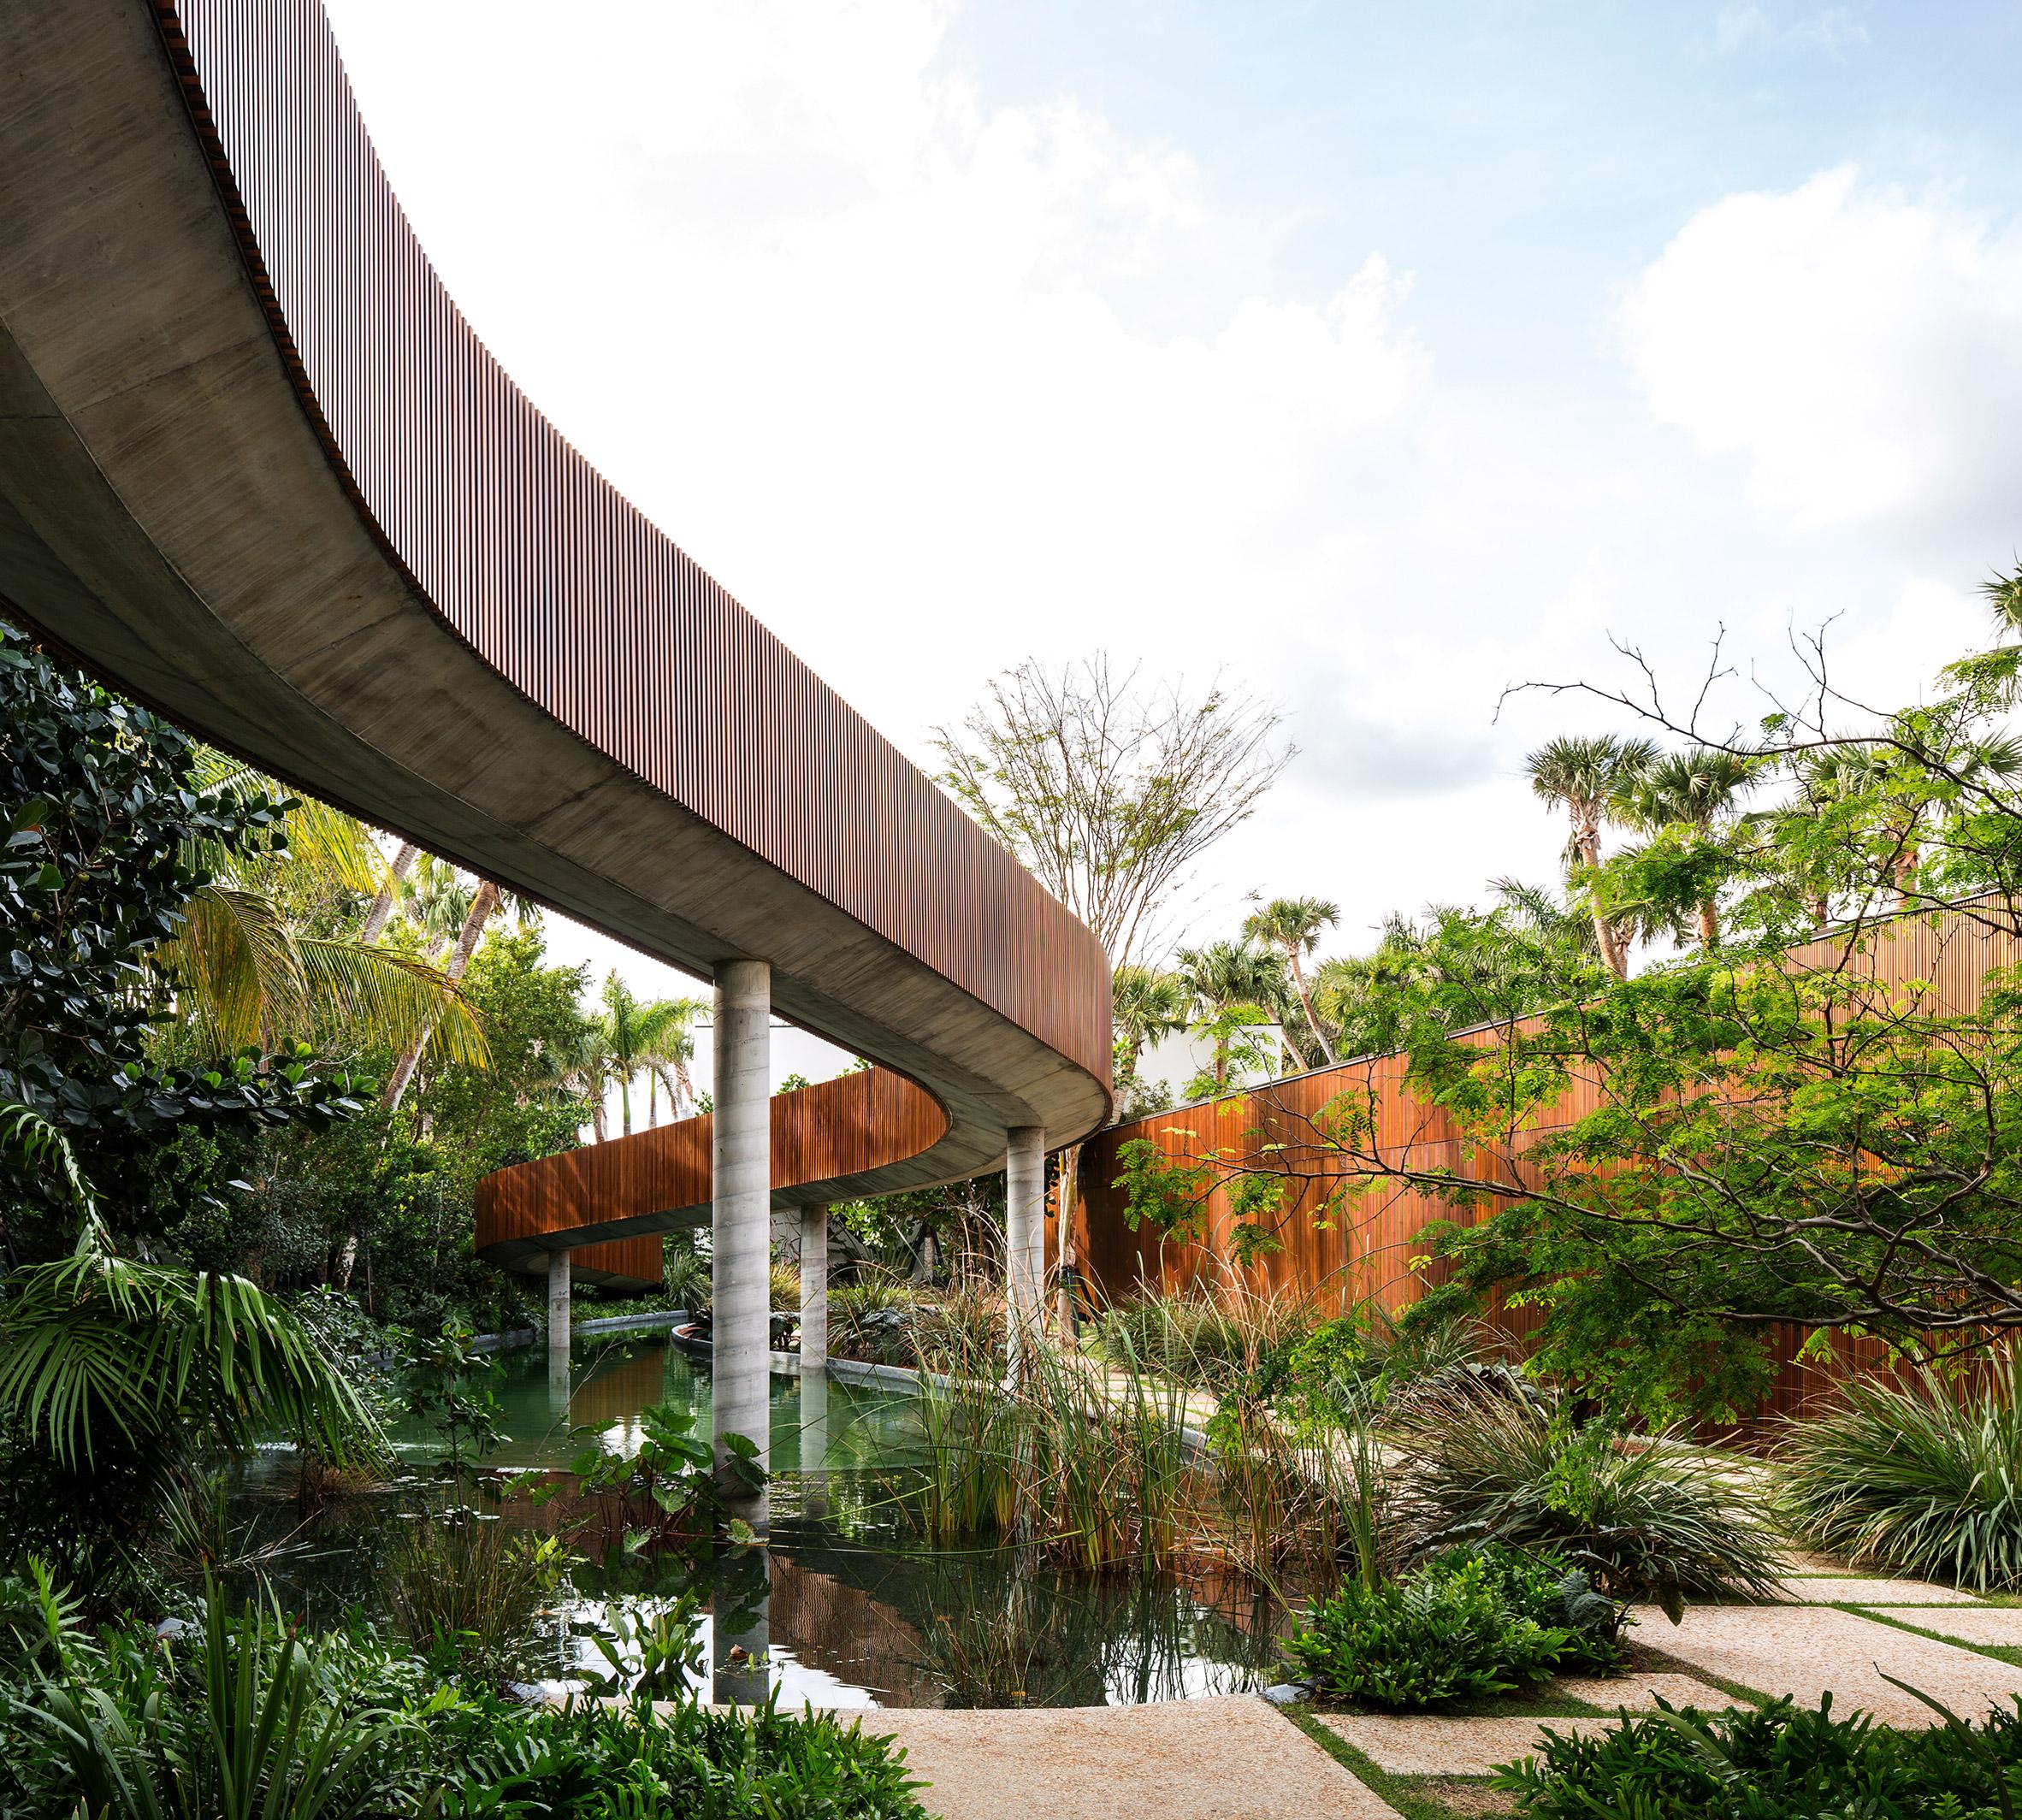 Foto: Arquitetura Studio MK27 - Marcio Kogan + Lair reis. Fotografia: Fran Parente. Interiores: Artefacto + Jader Almeida.